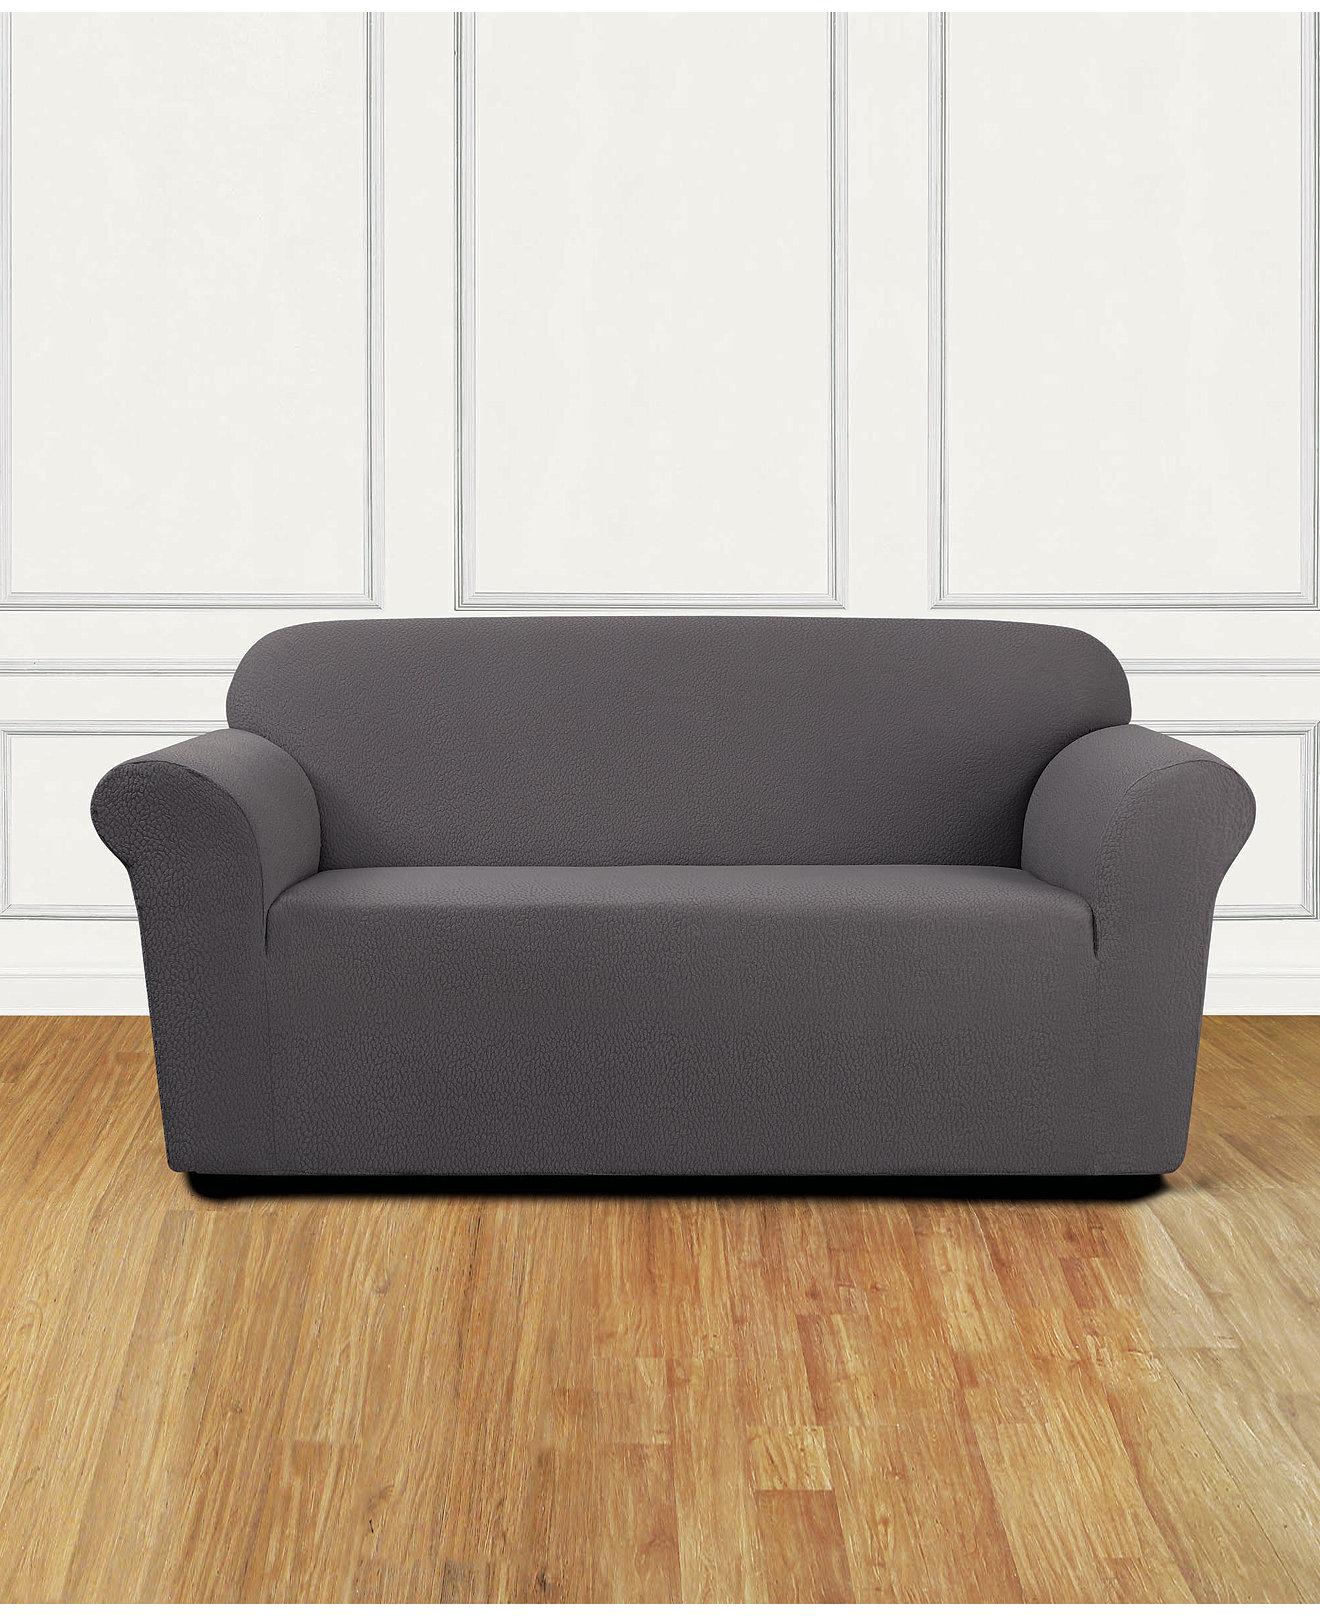 sofa loveseat chair slipcover set hereo sofa